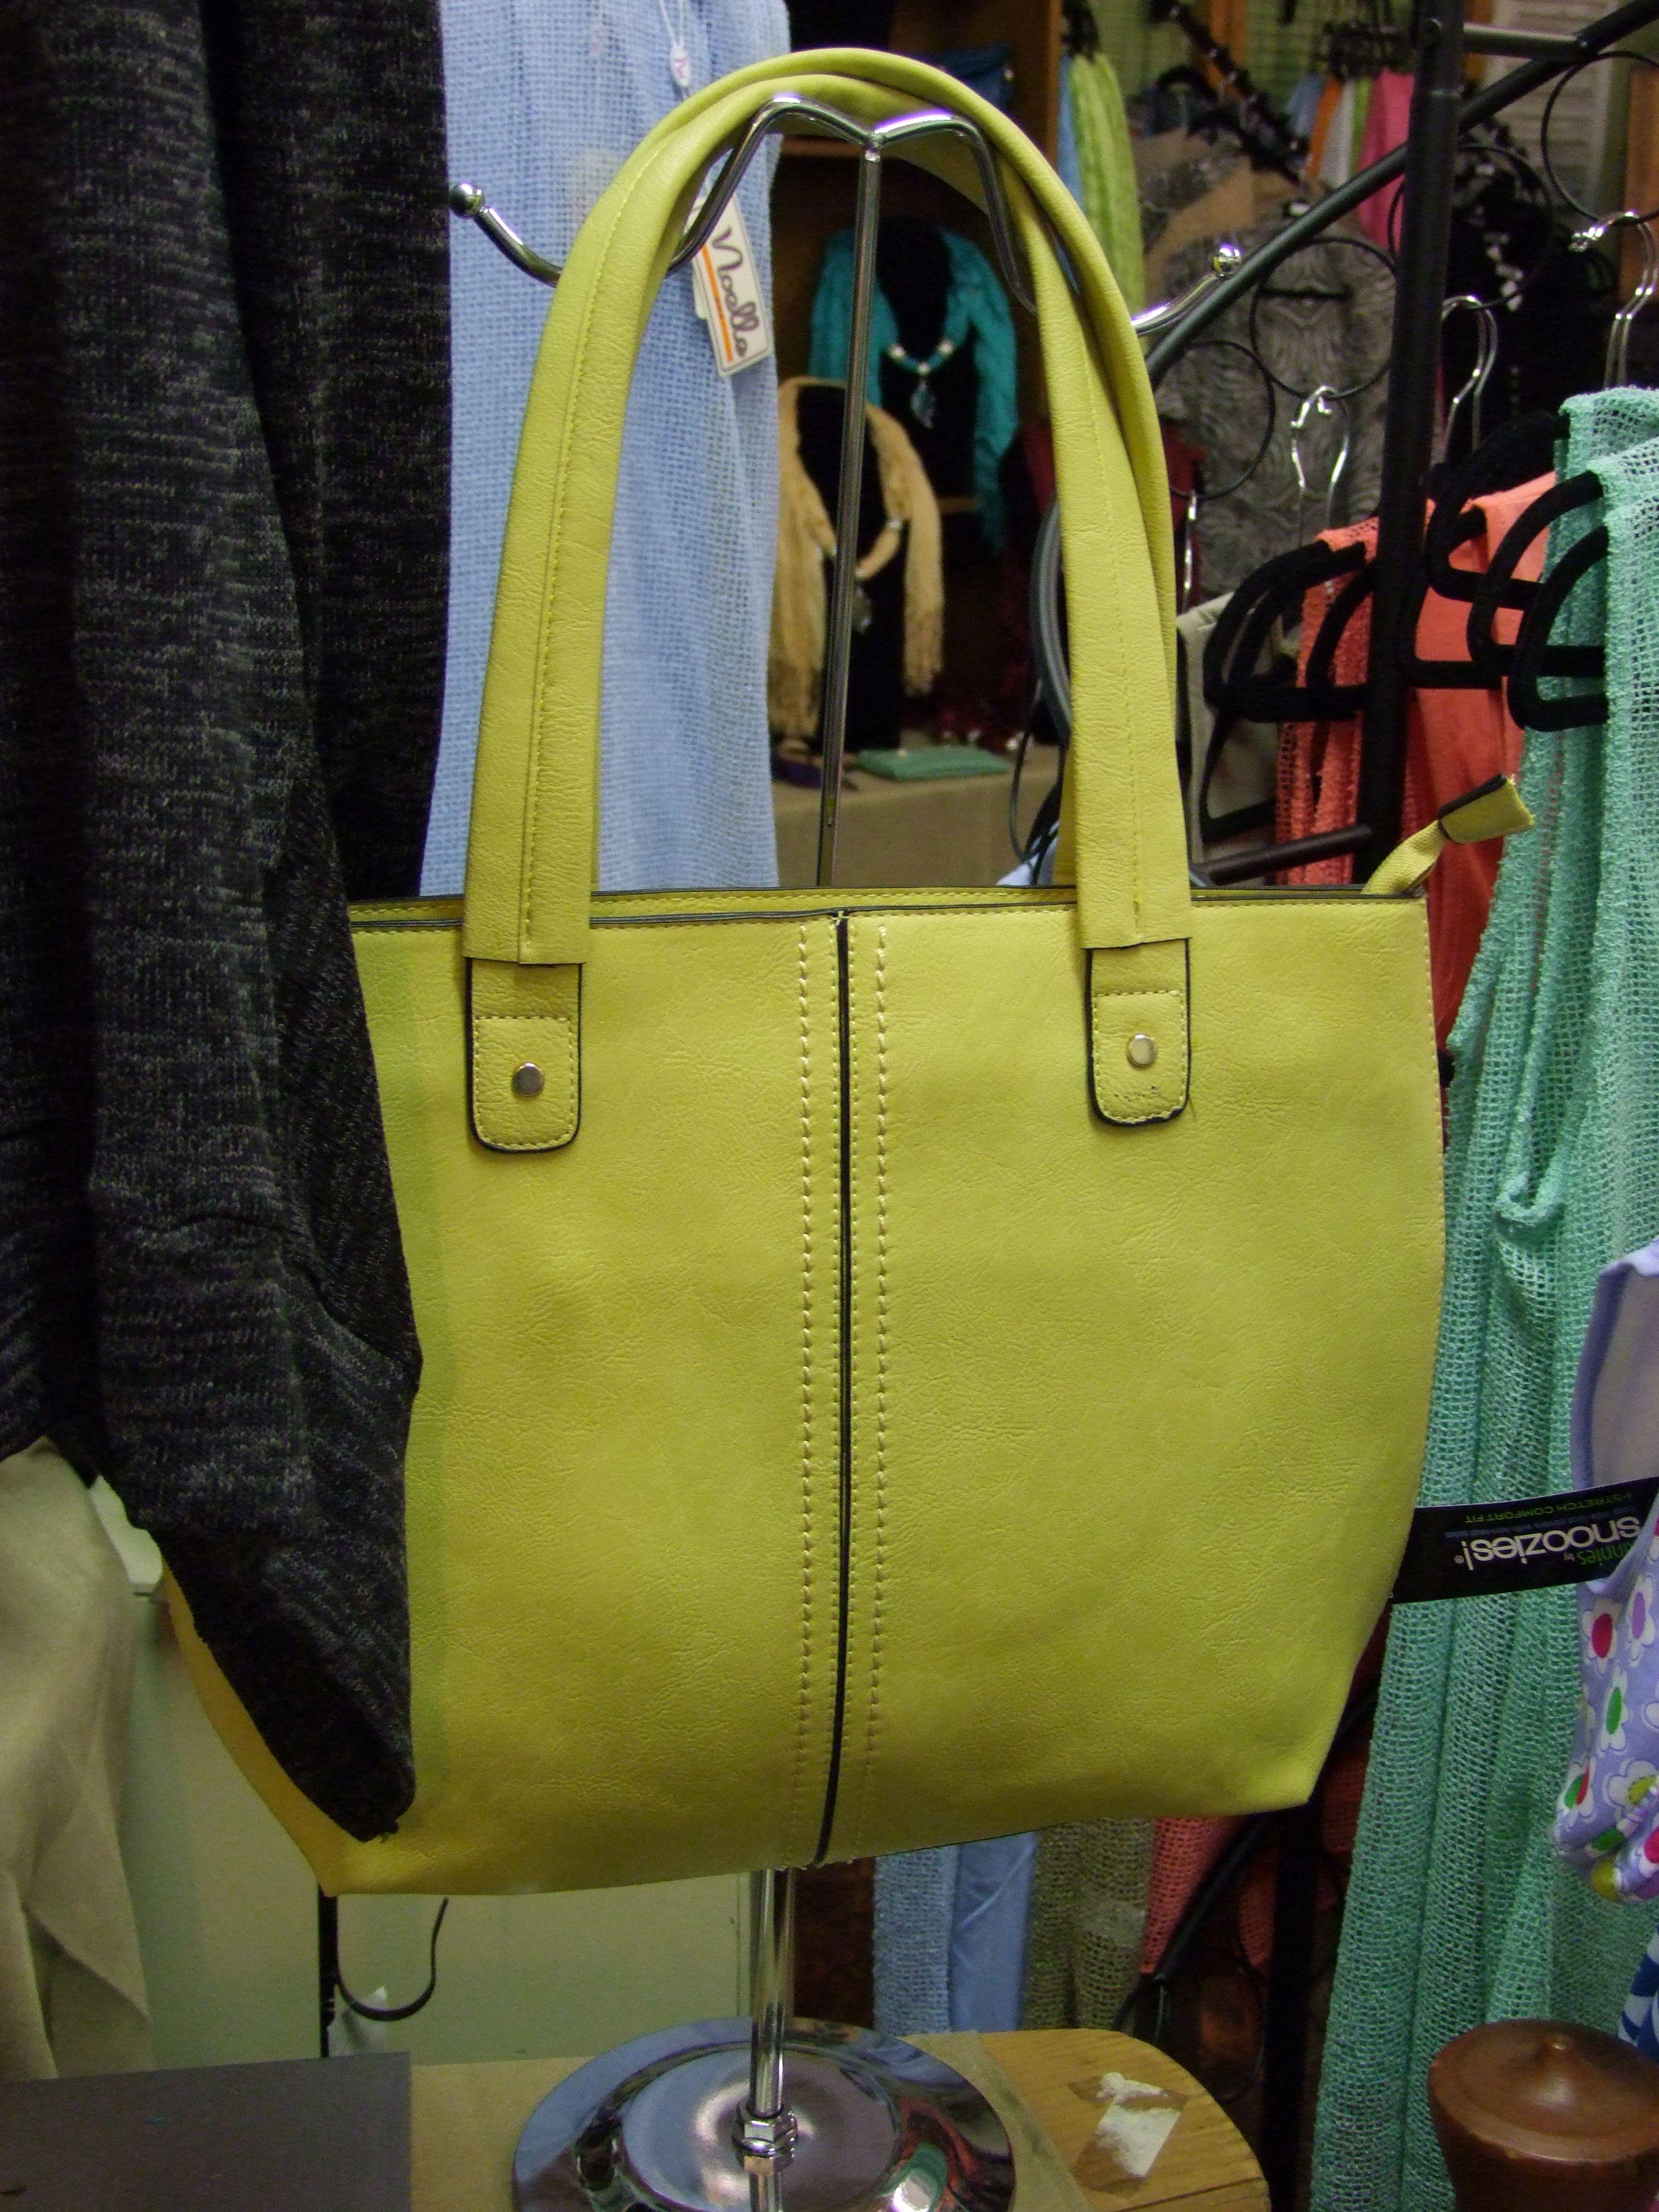 cc6f964664d5 Handbag from B. Lush by Passion